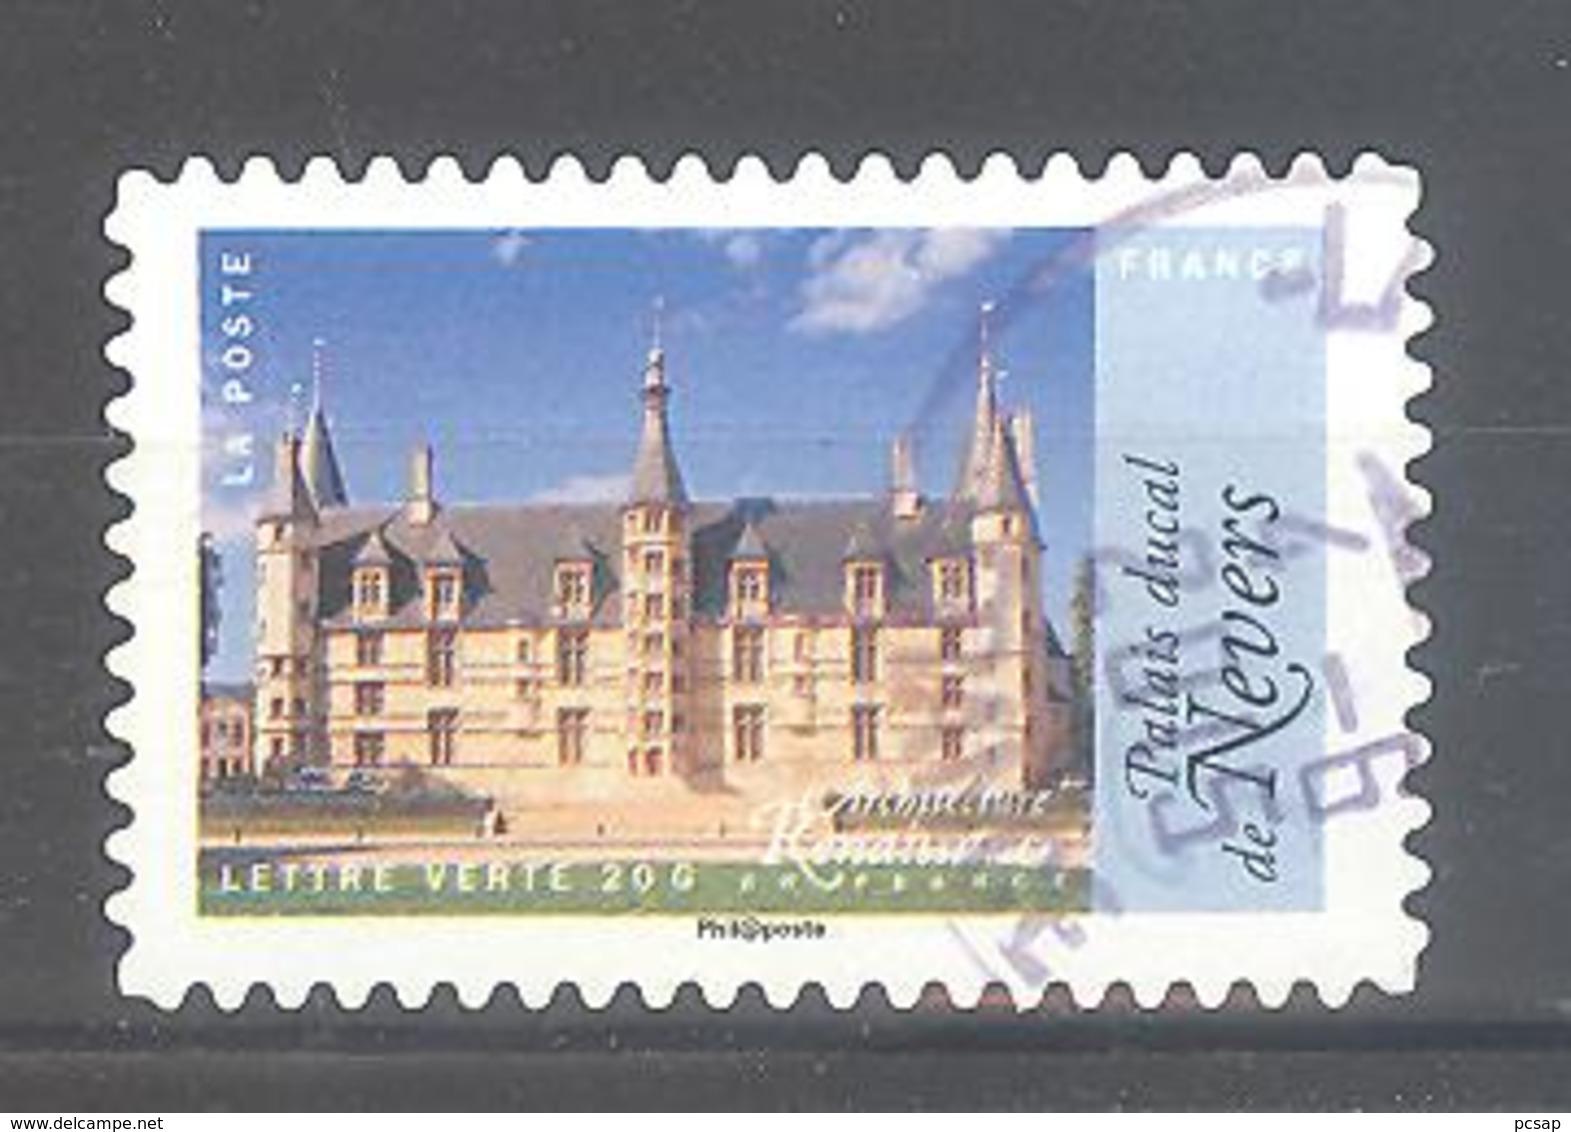 France Autoadhésif Oblitéré N°1110 (cachet Rond) - France